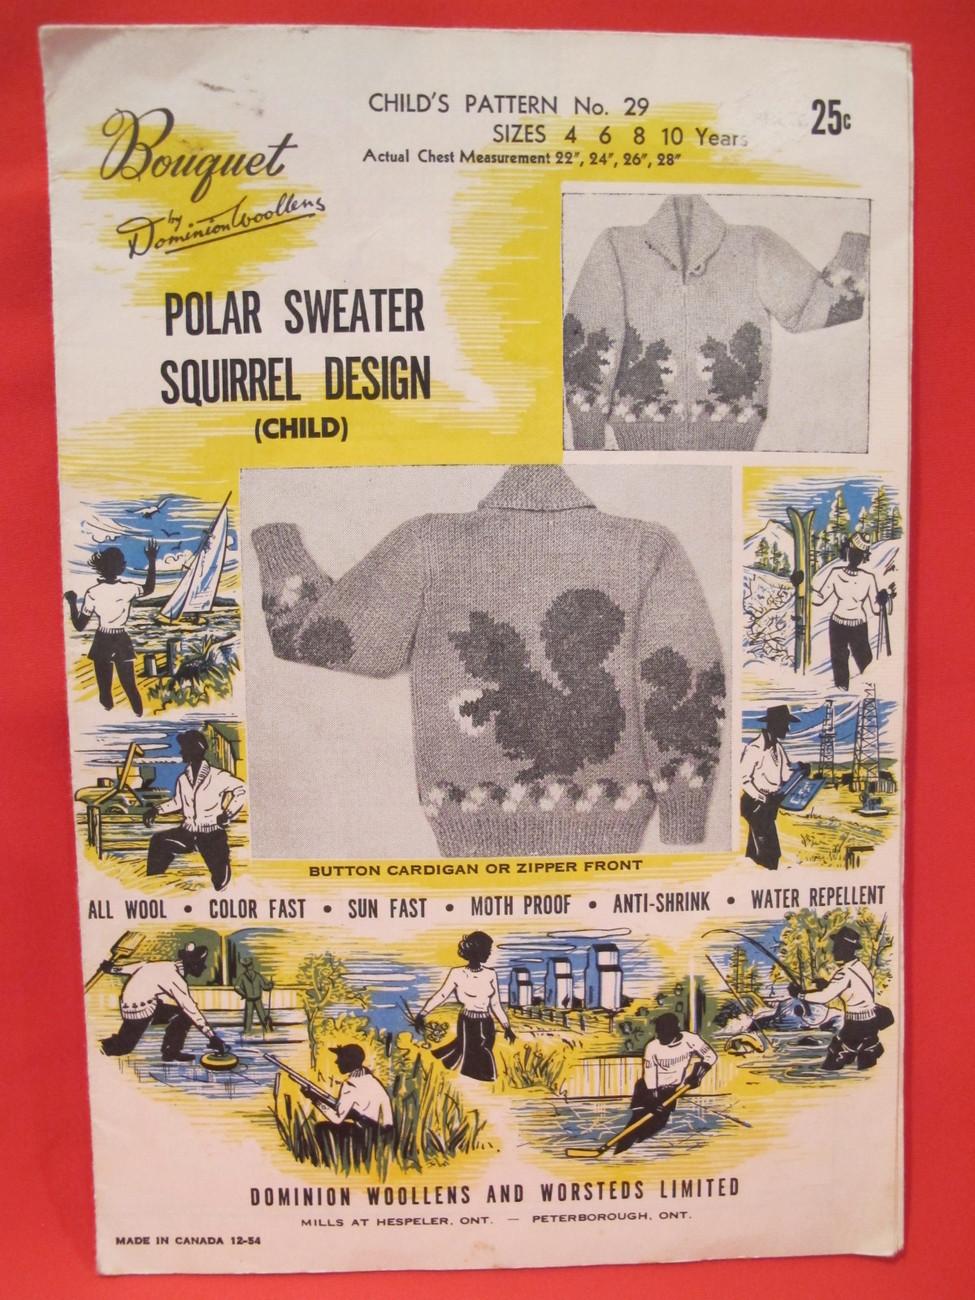 Vintage 1954 Knitting Pattern CHILDRENS Polar Sweater Squirrel Design Size 4 10 - $6.99